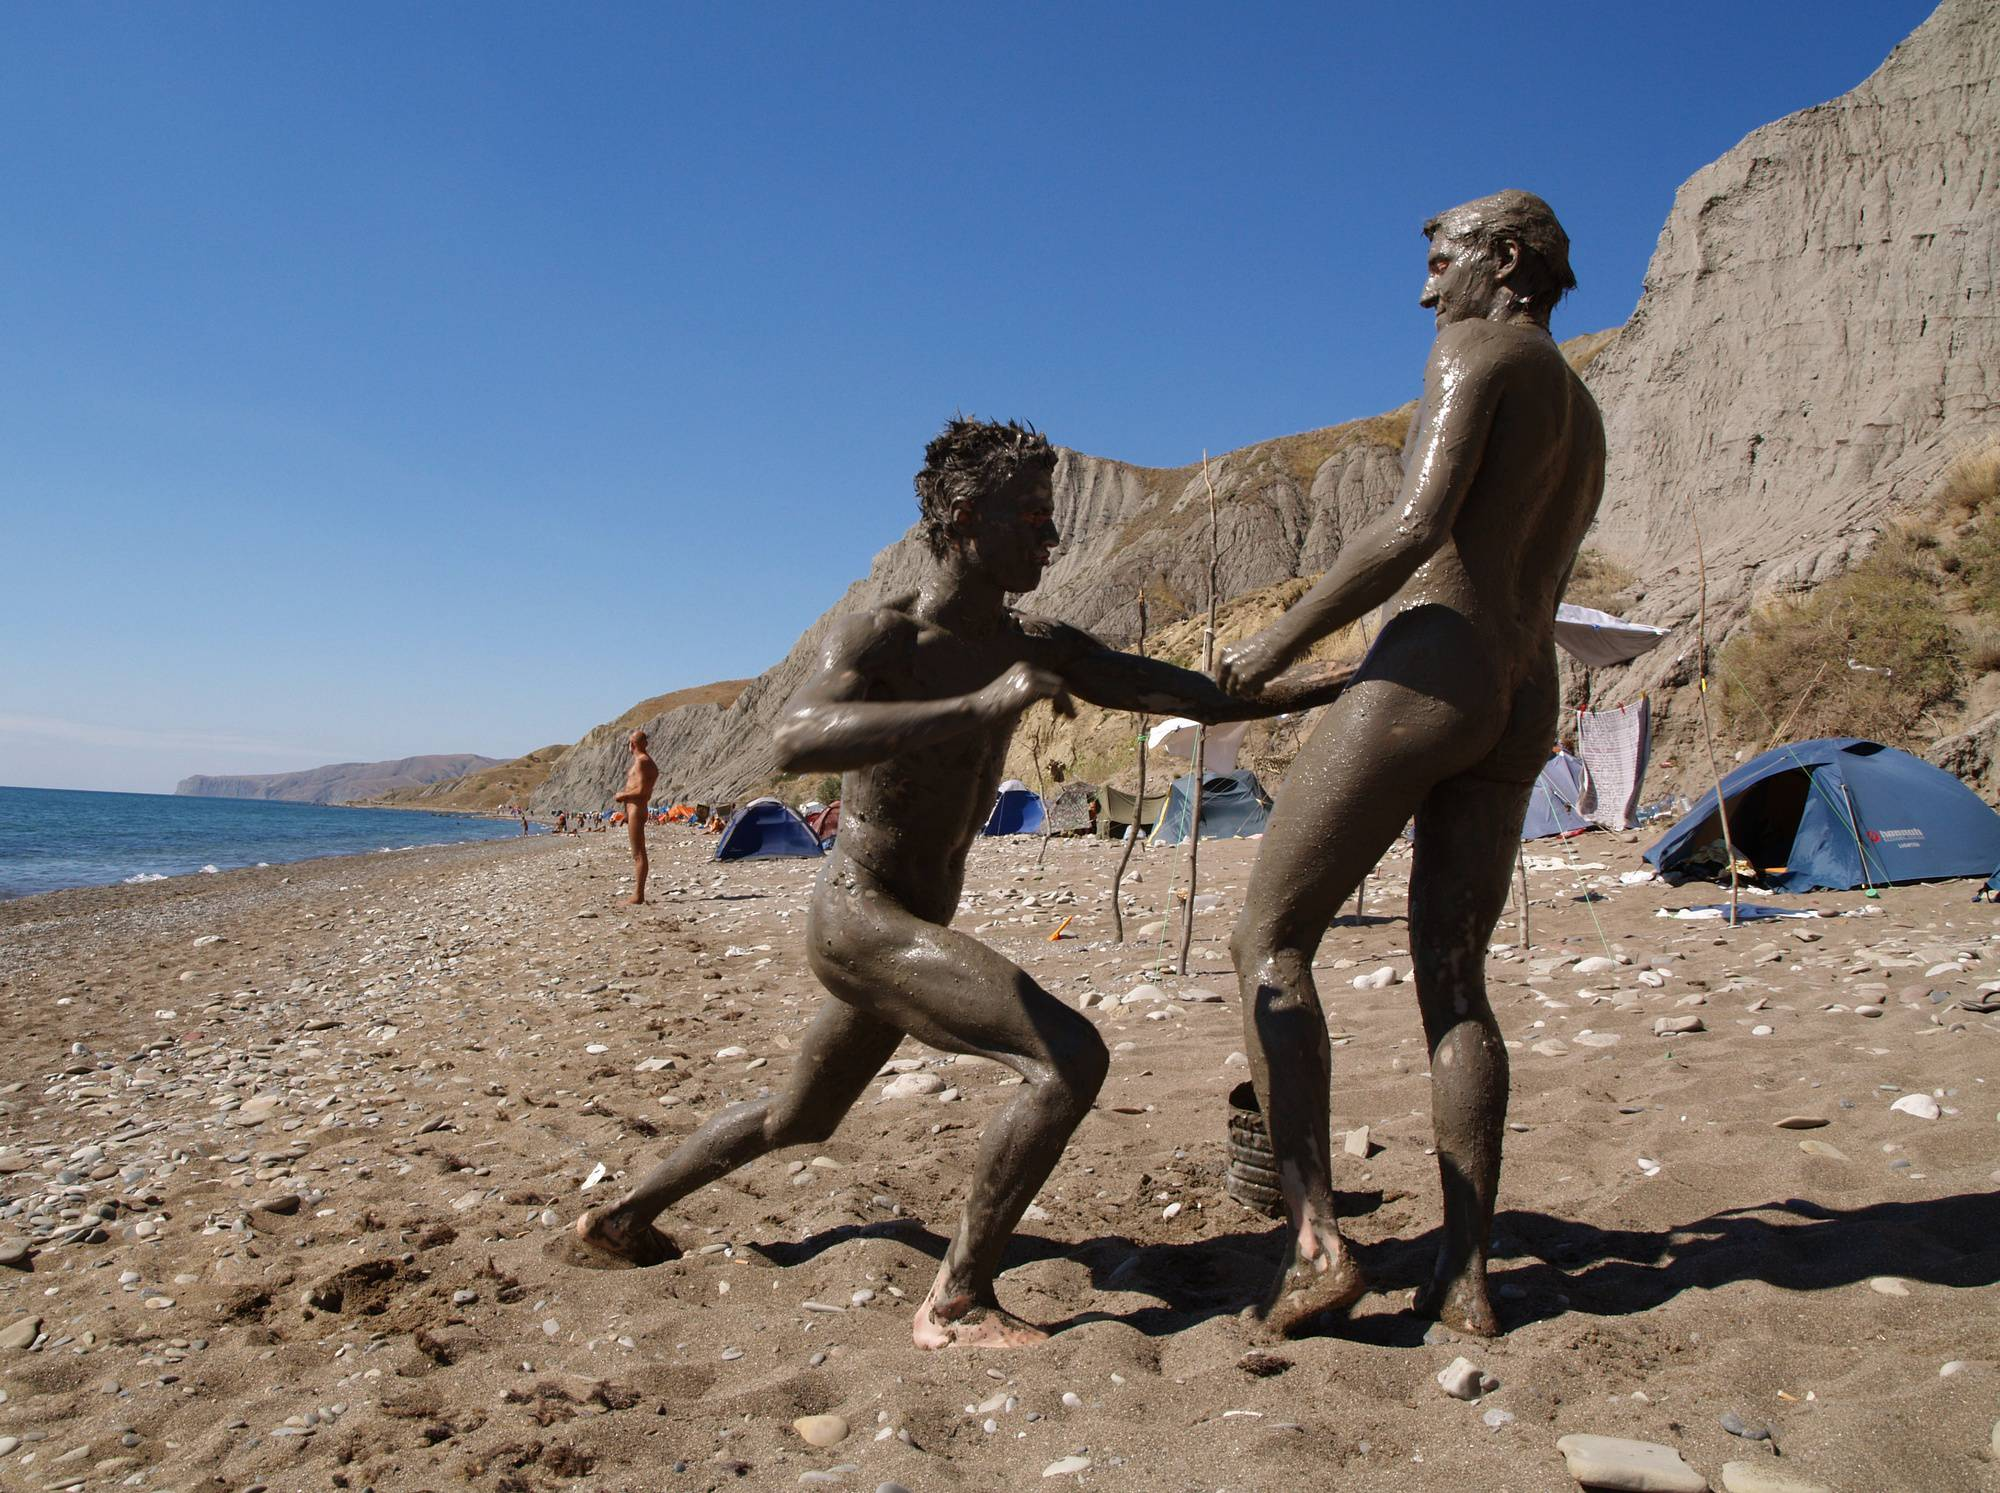 Purenudism Photos-Nude Beach Mud Soldiers - 3